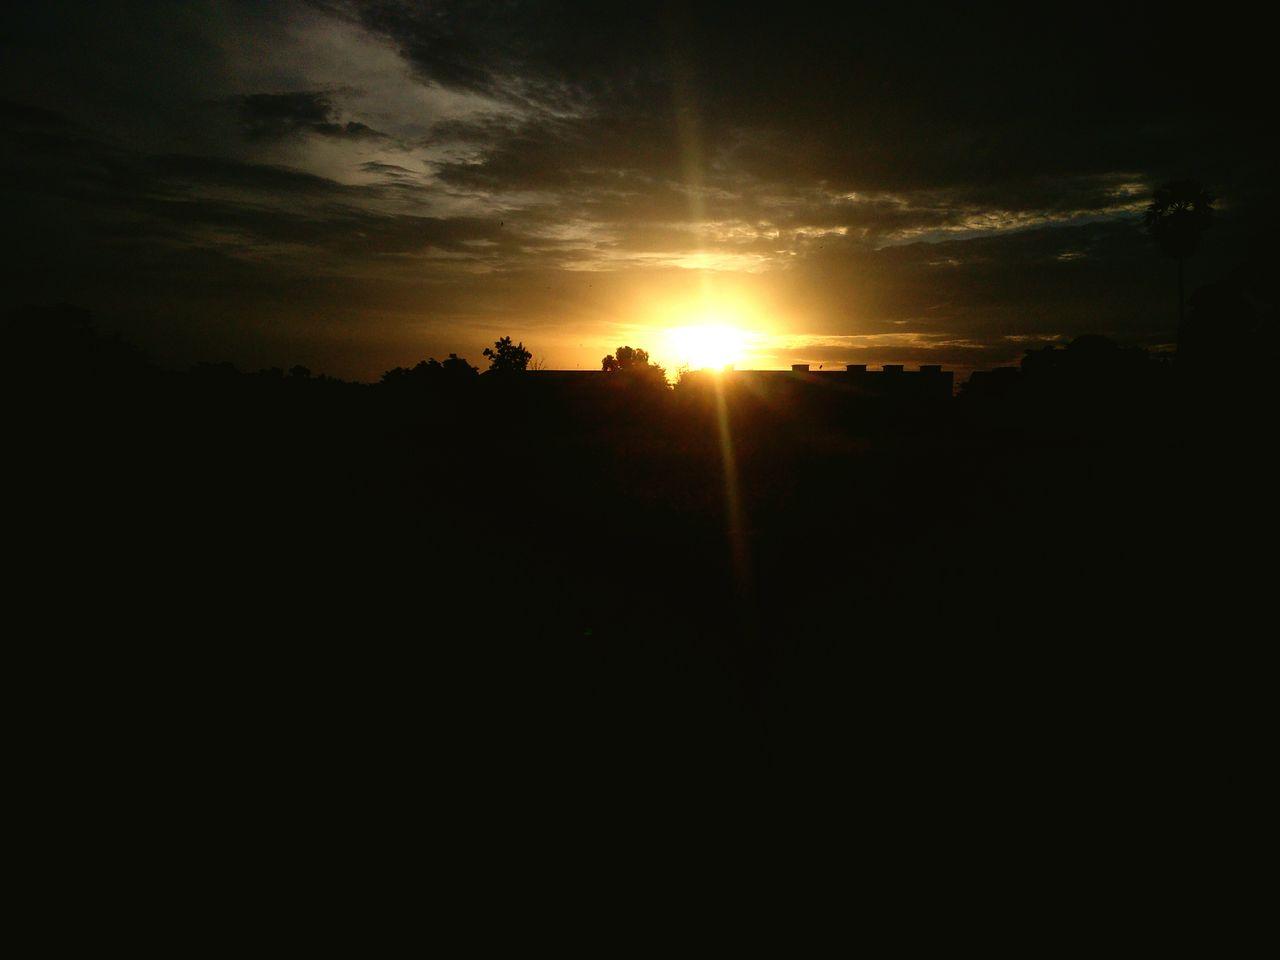 sunset, silhouette, sun, dark, nature, no people, sky, beauty in nature, scenics, outdoors